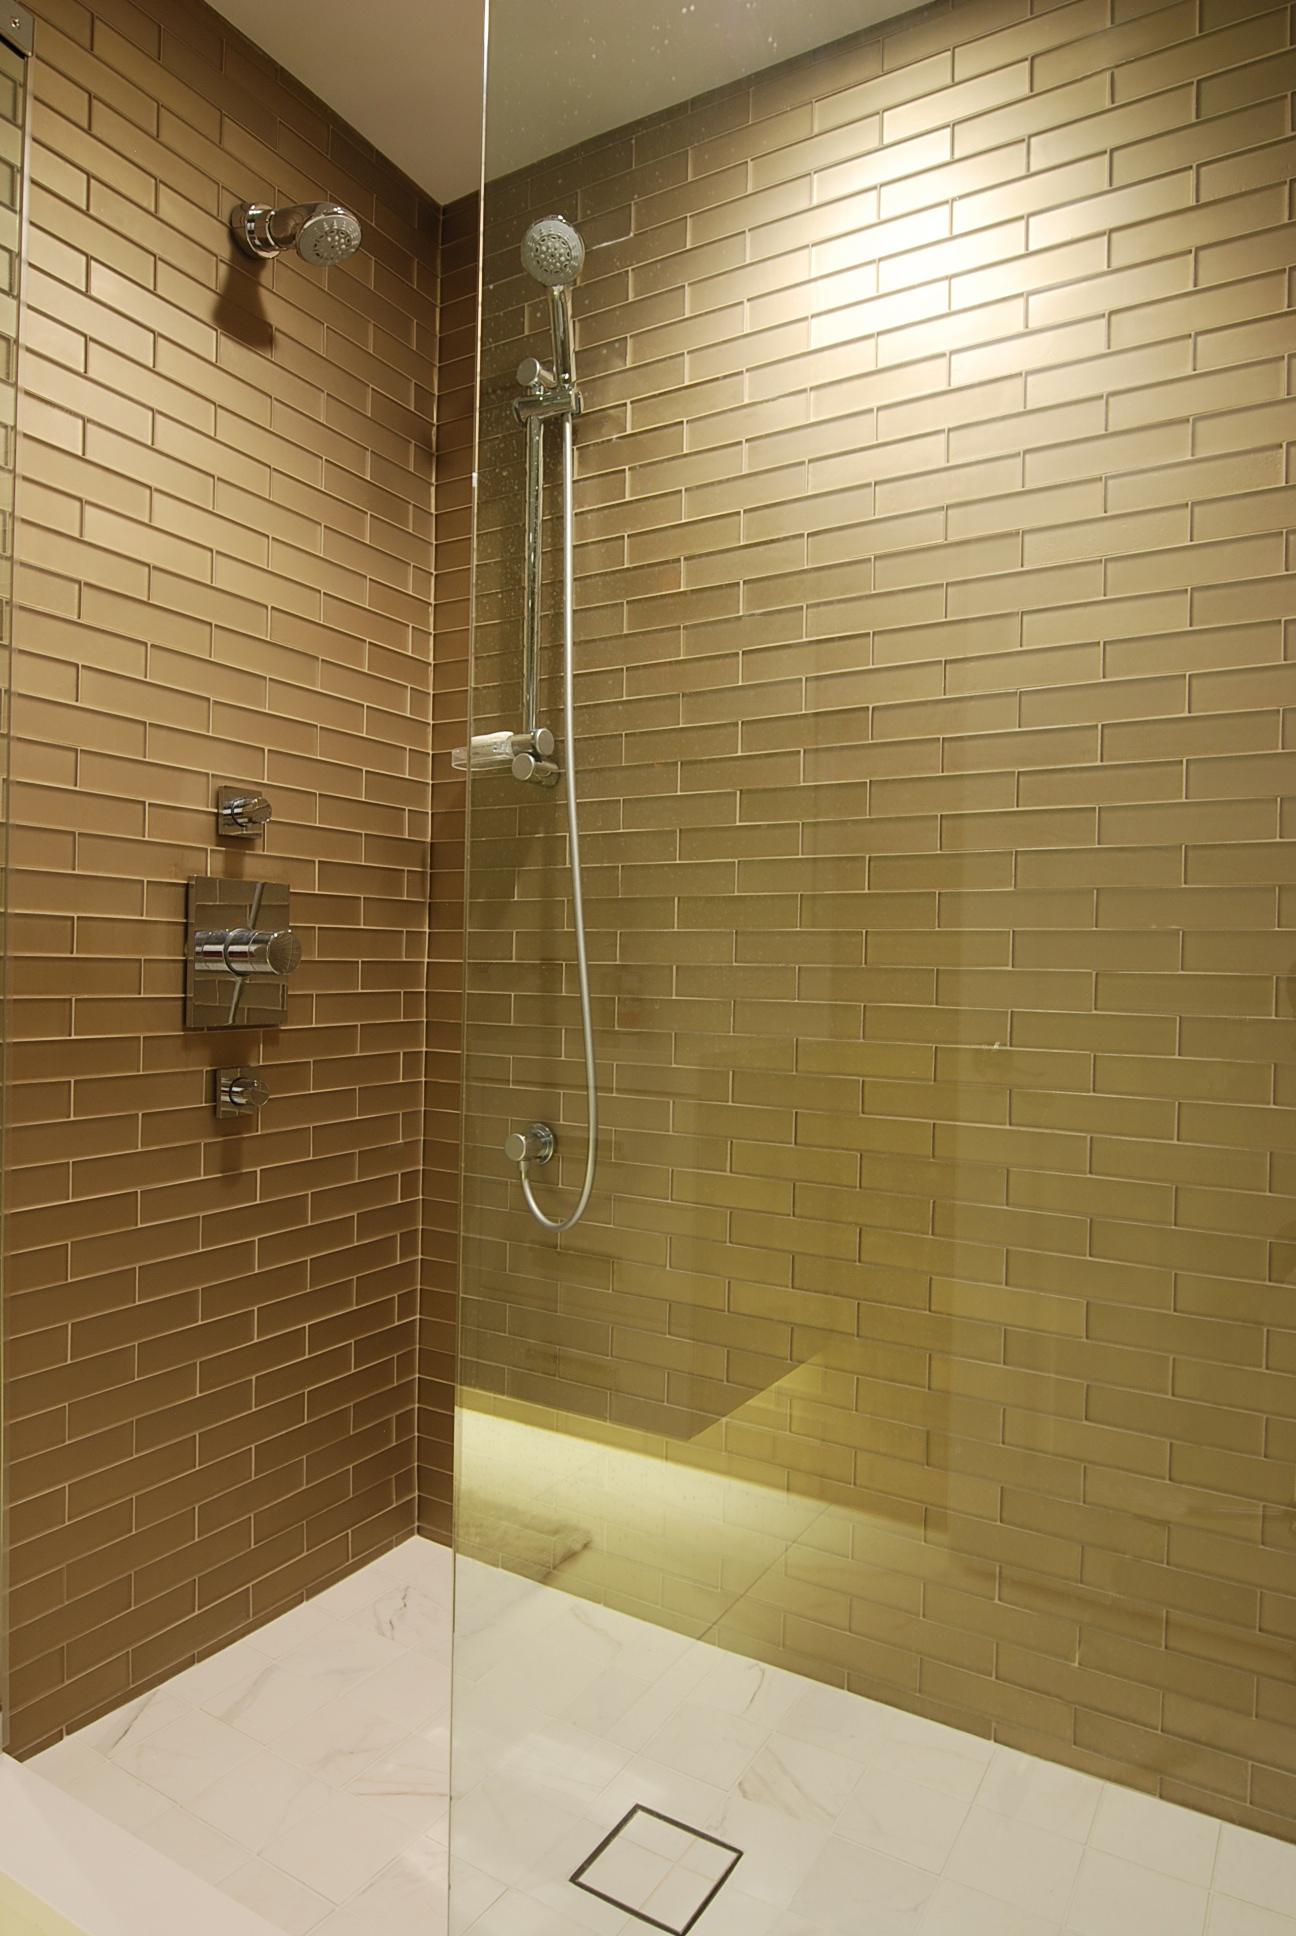 Bathroom Remodeling: Tips For Choosing Tile For Your Shower